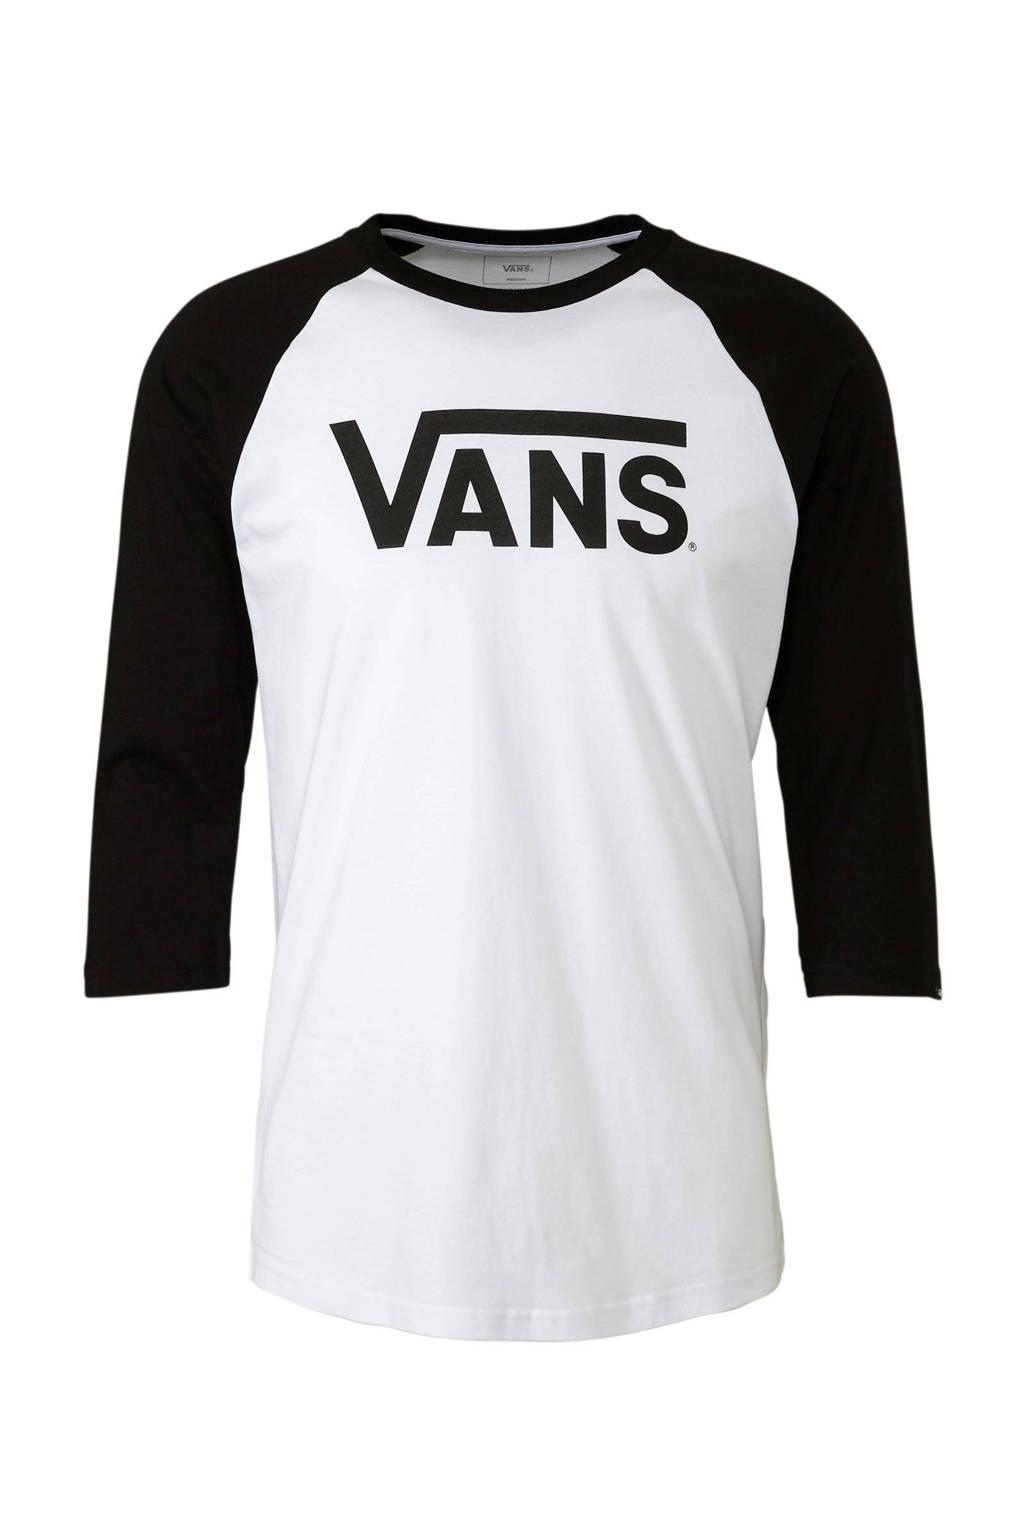 VANS T-shirt wit/zwart, Wit/zwart